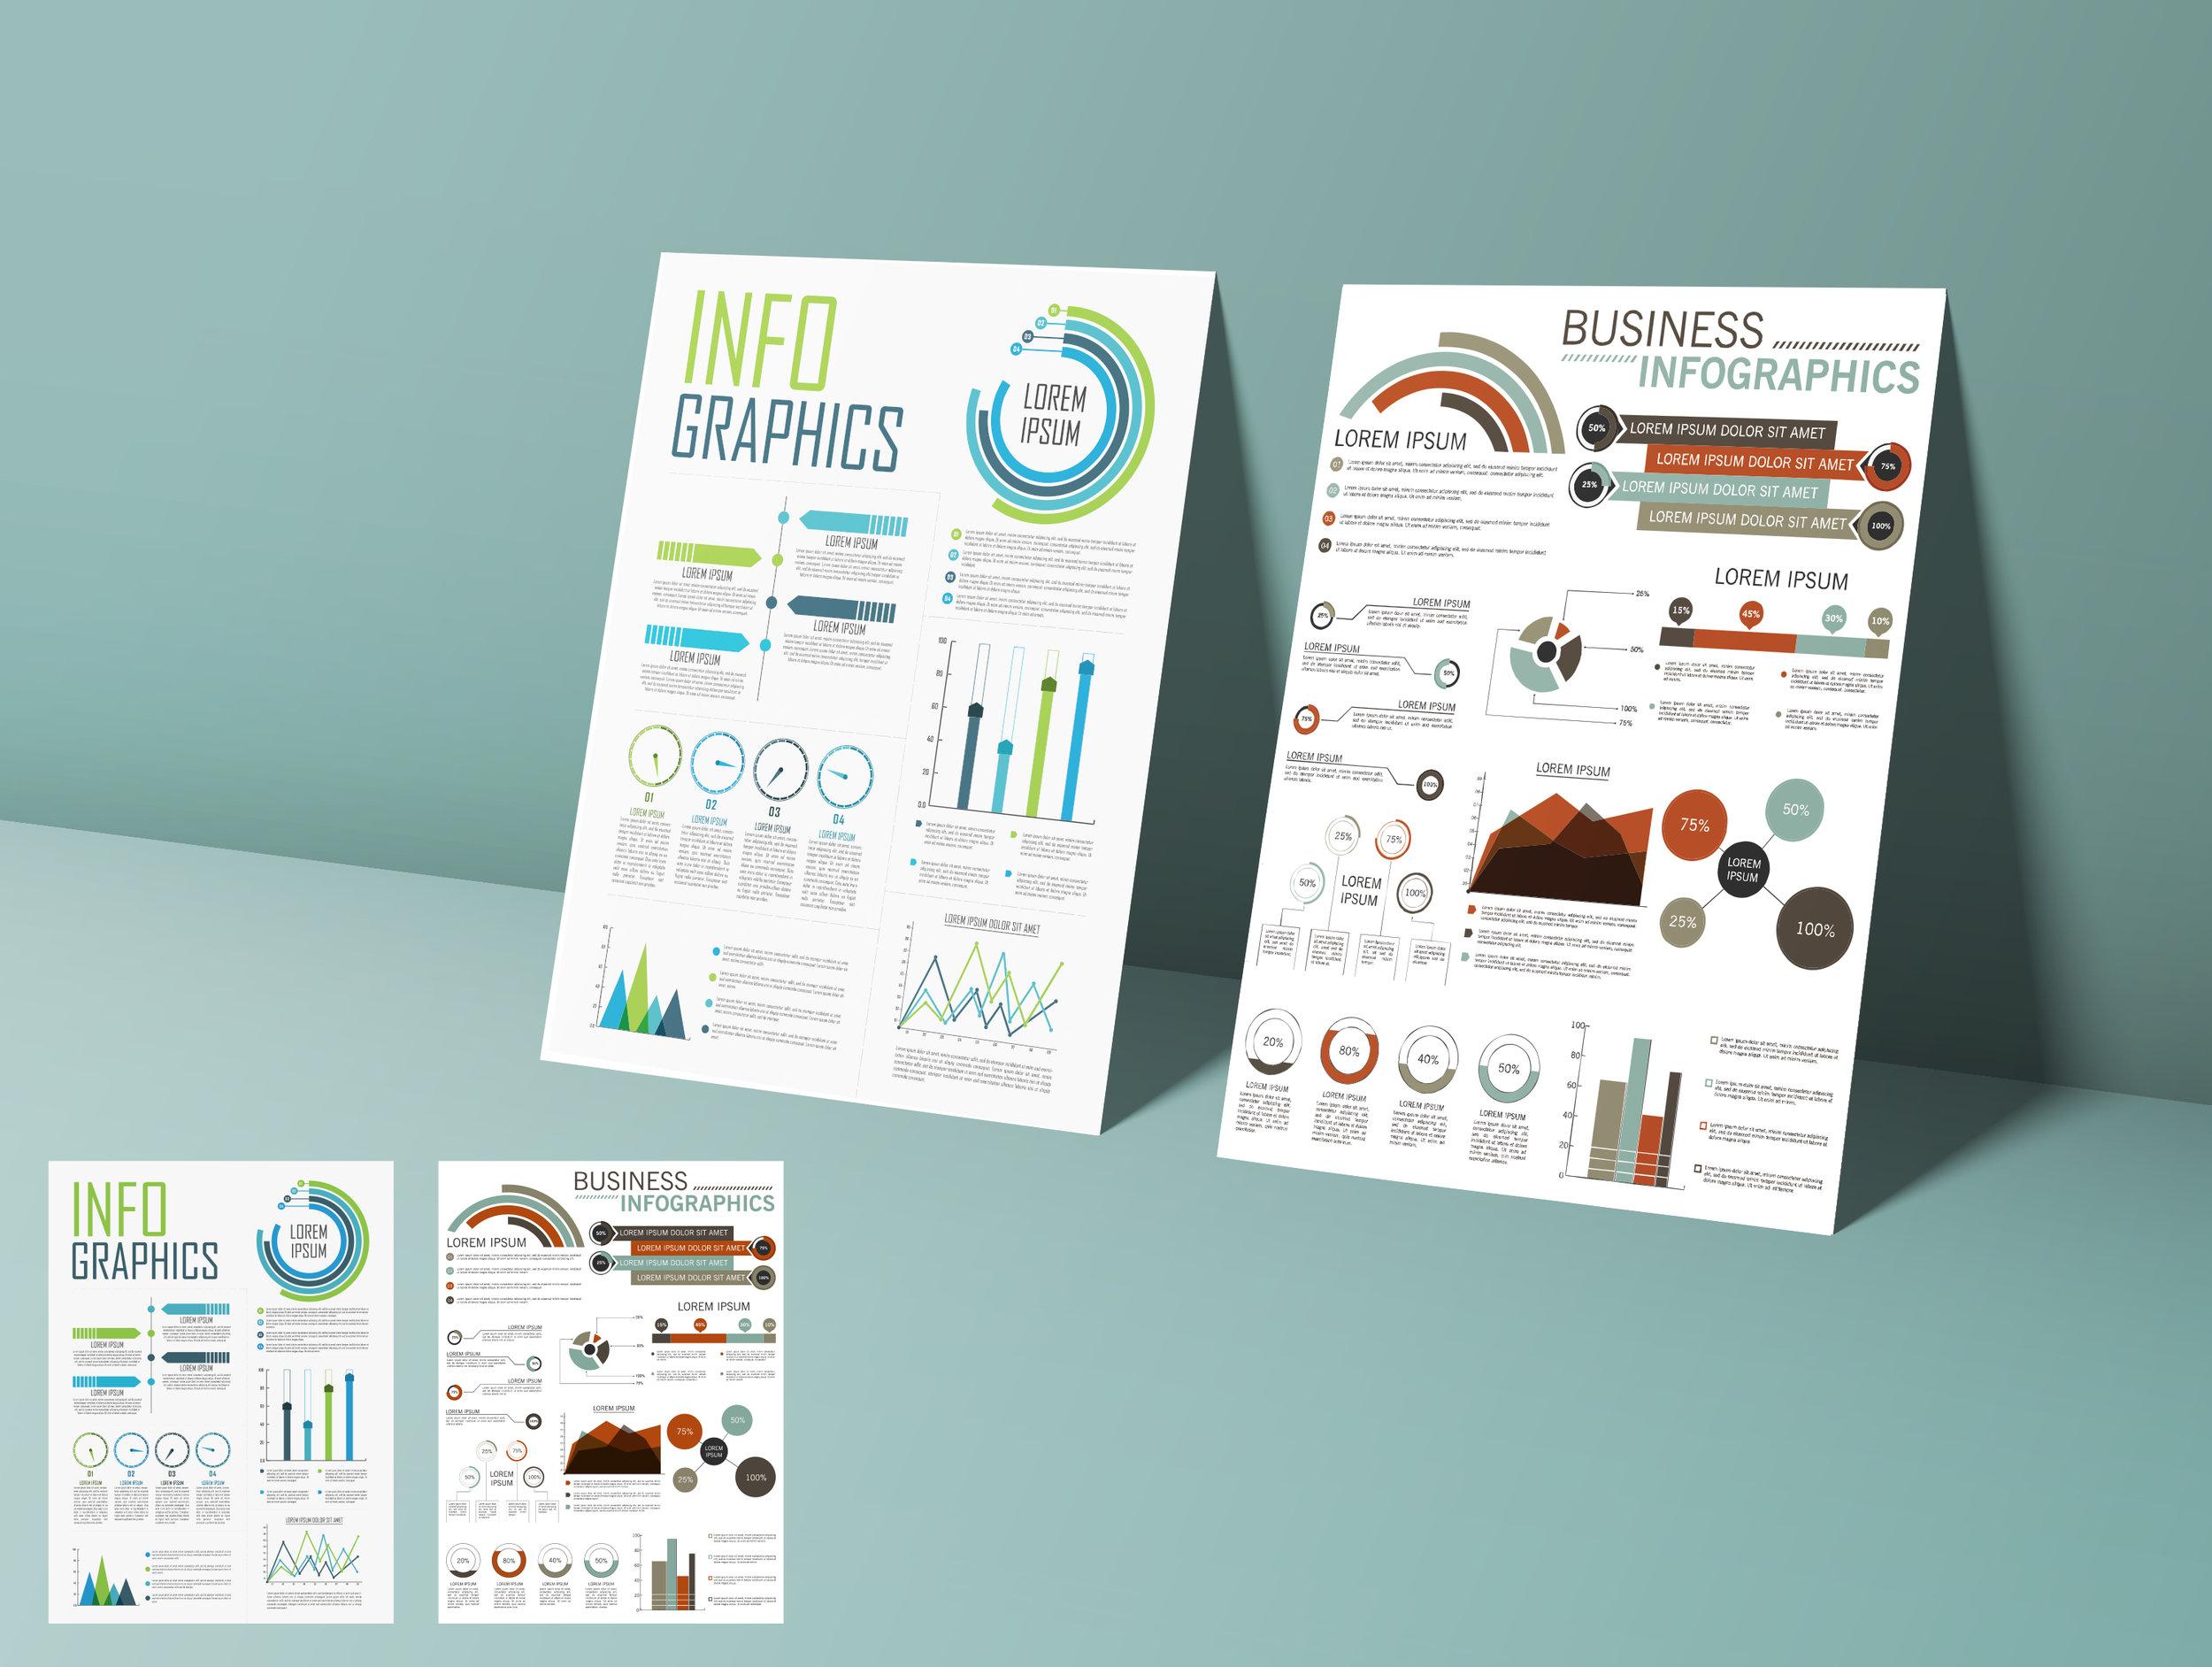 infographics_110061715-1115-allint-2_L.jpg